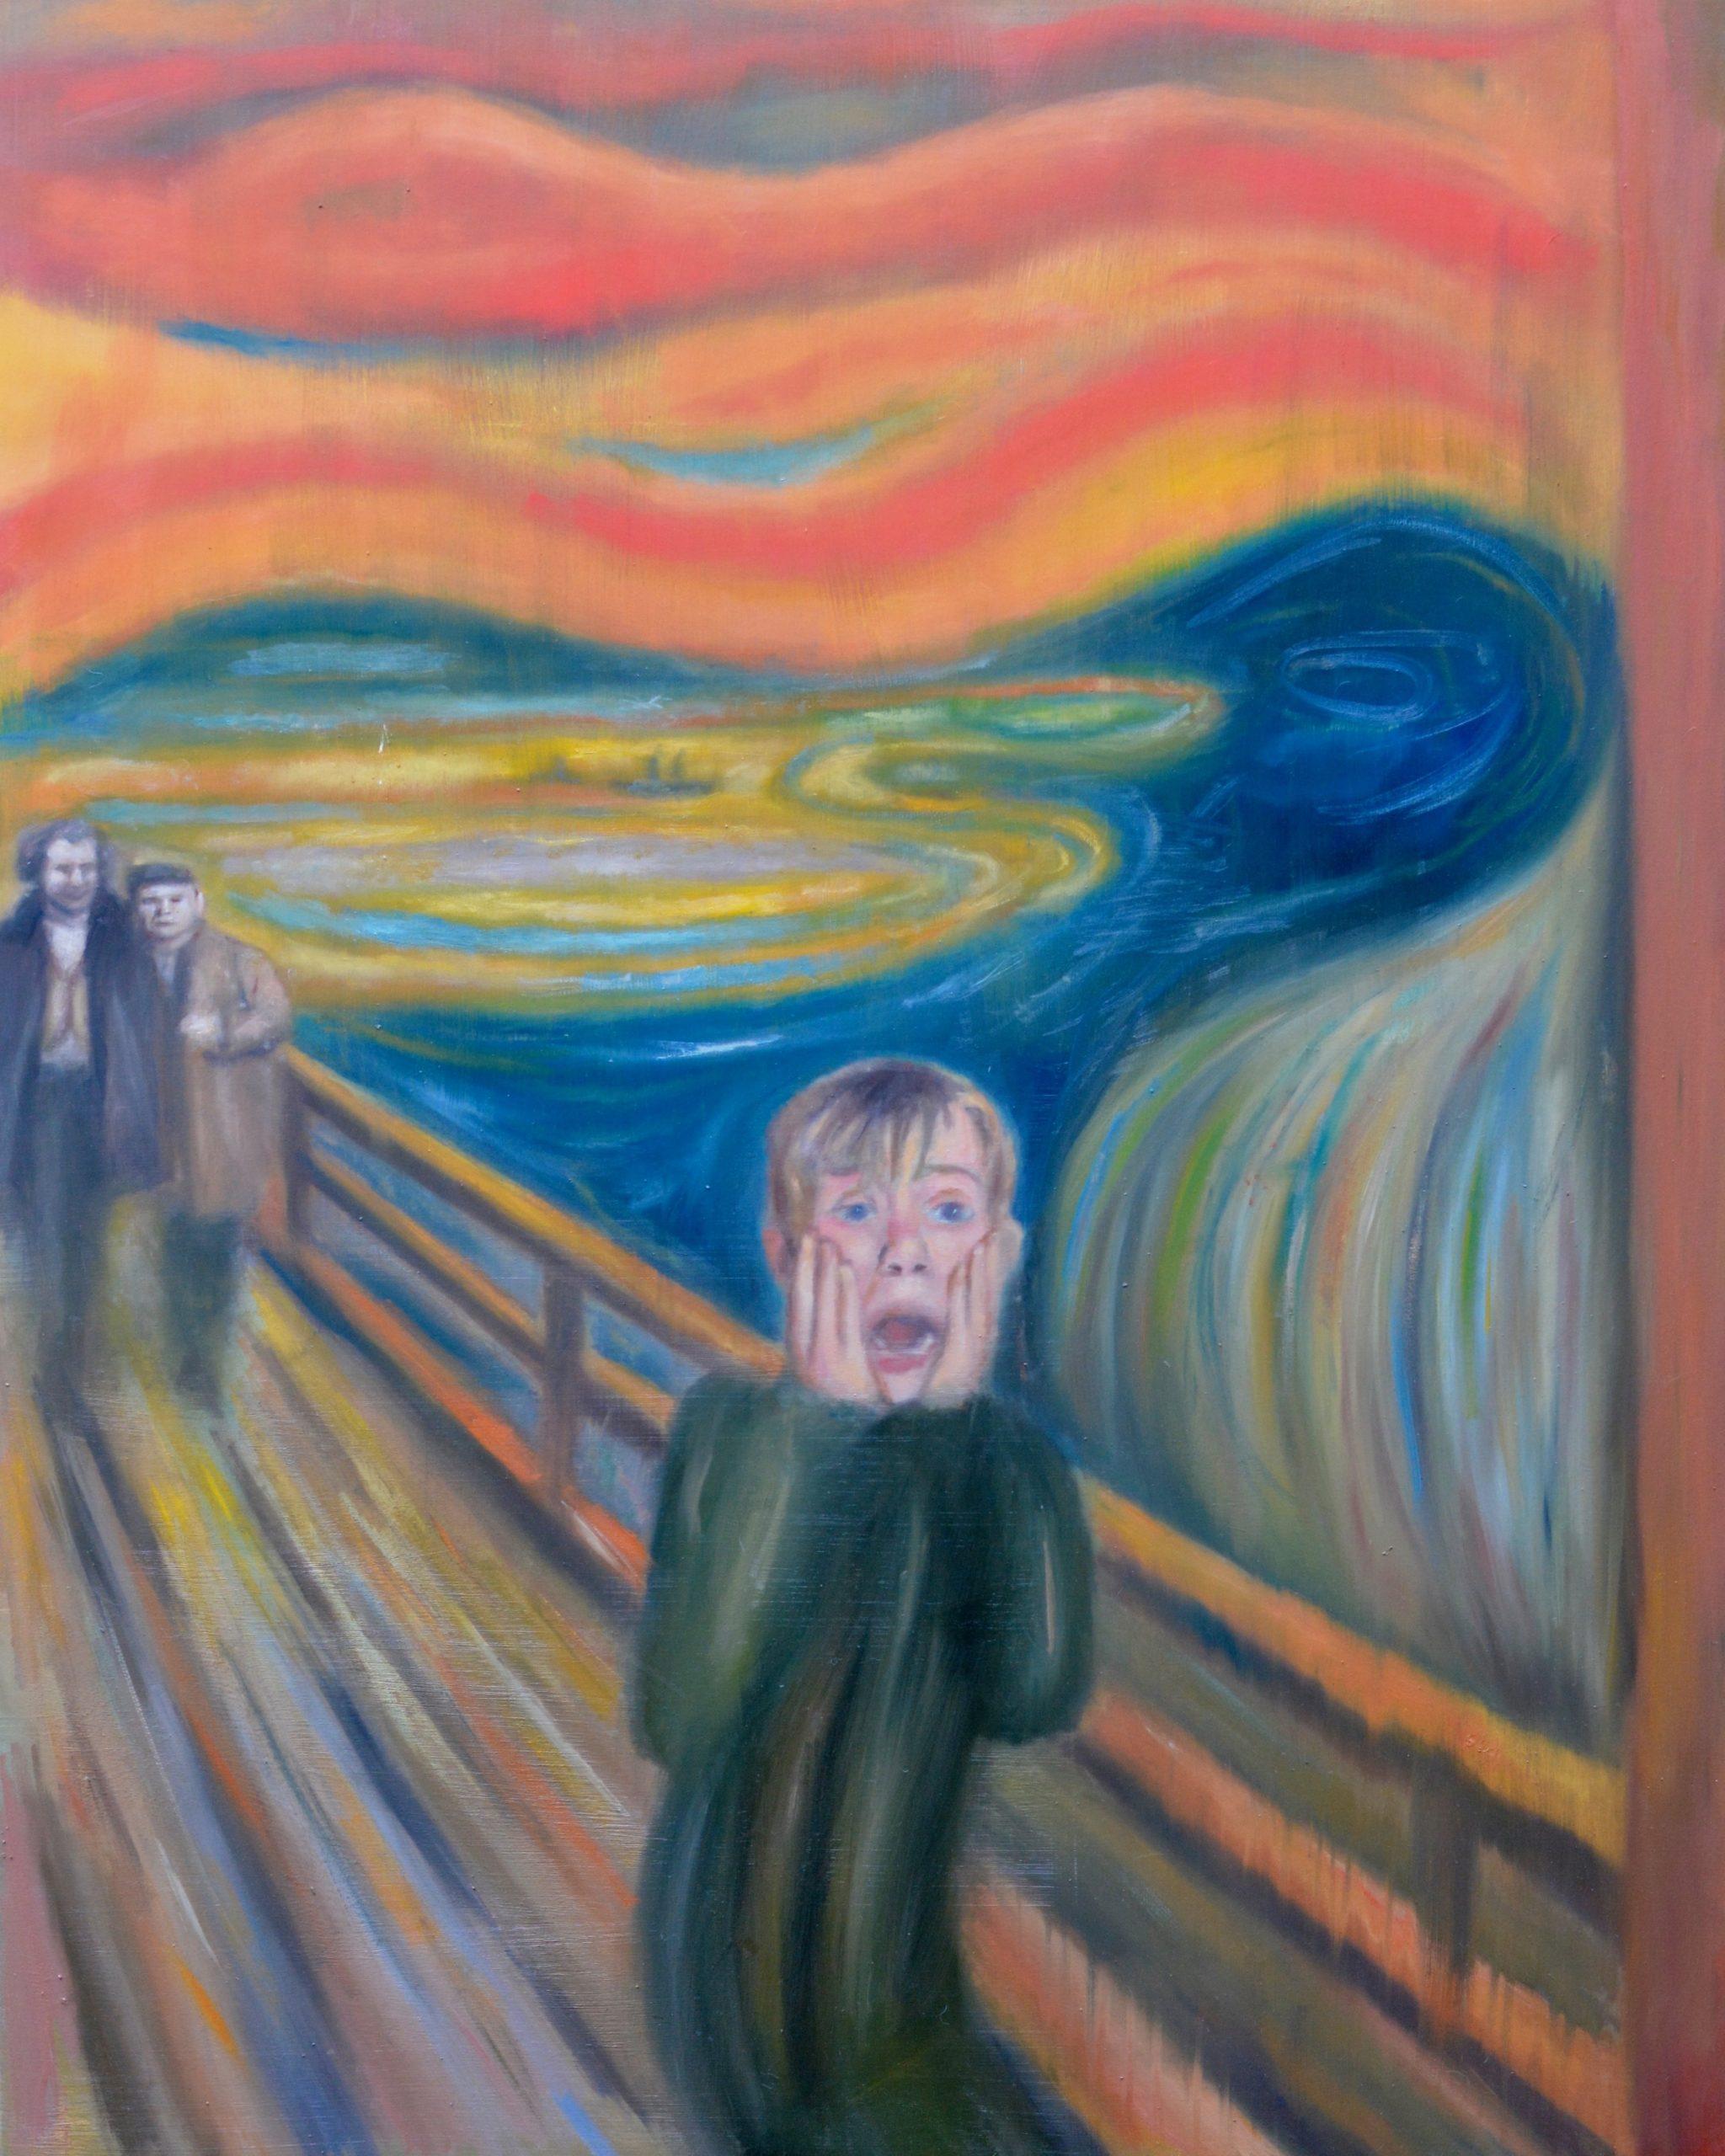 Scream Alone by Tim Gatenby